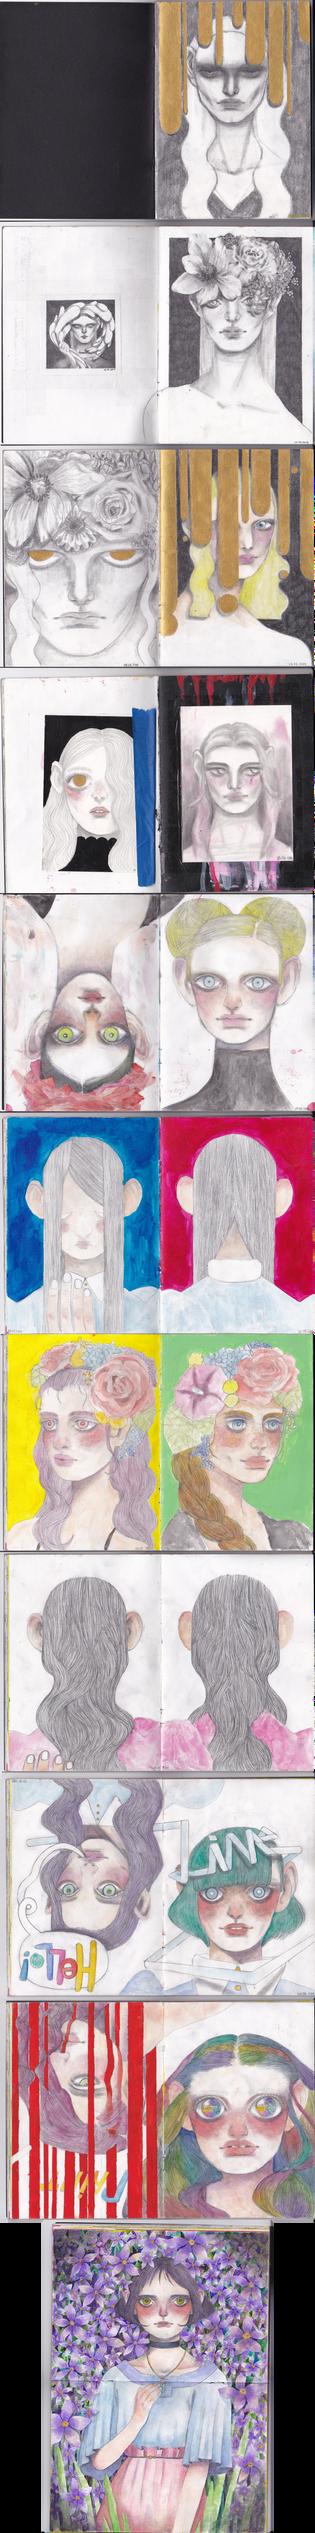 may-aug sketchbook 1 by likrot